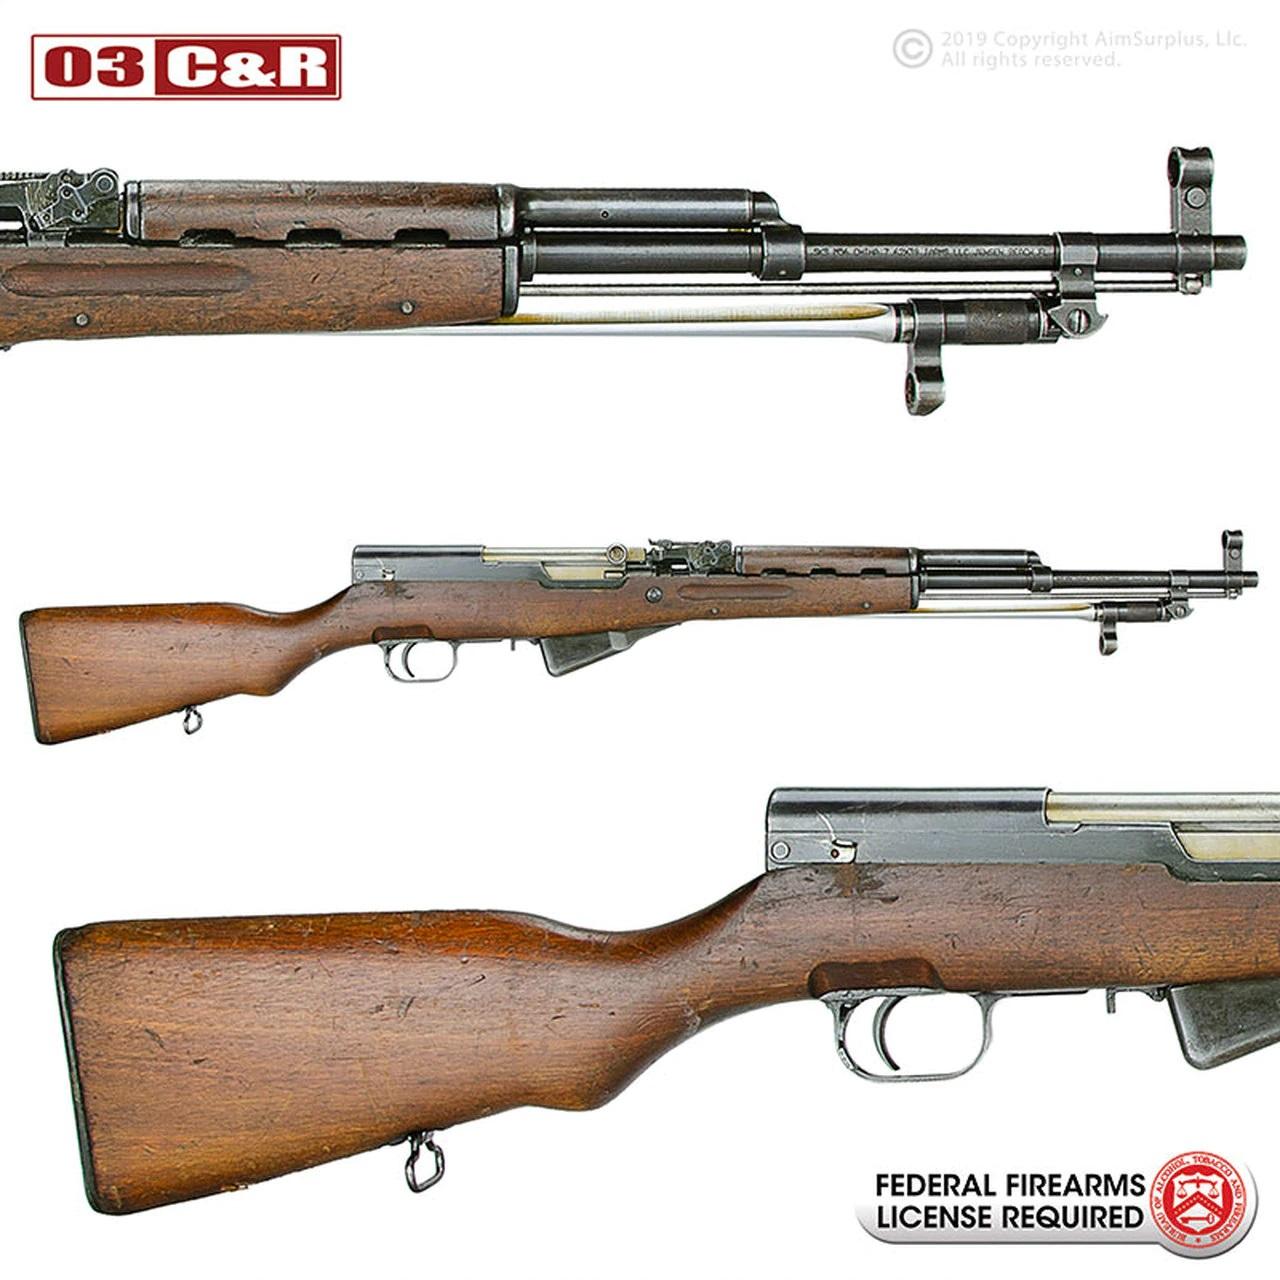 Chinese Type 56 SKS 7 62x39 Rifles Grade 1 - $399 95